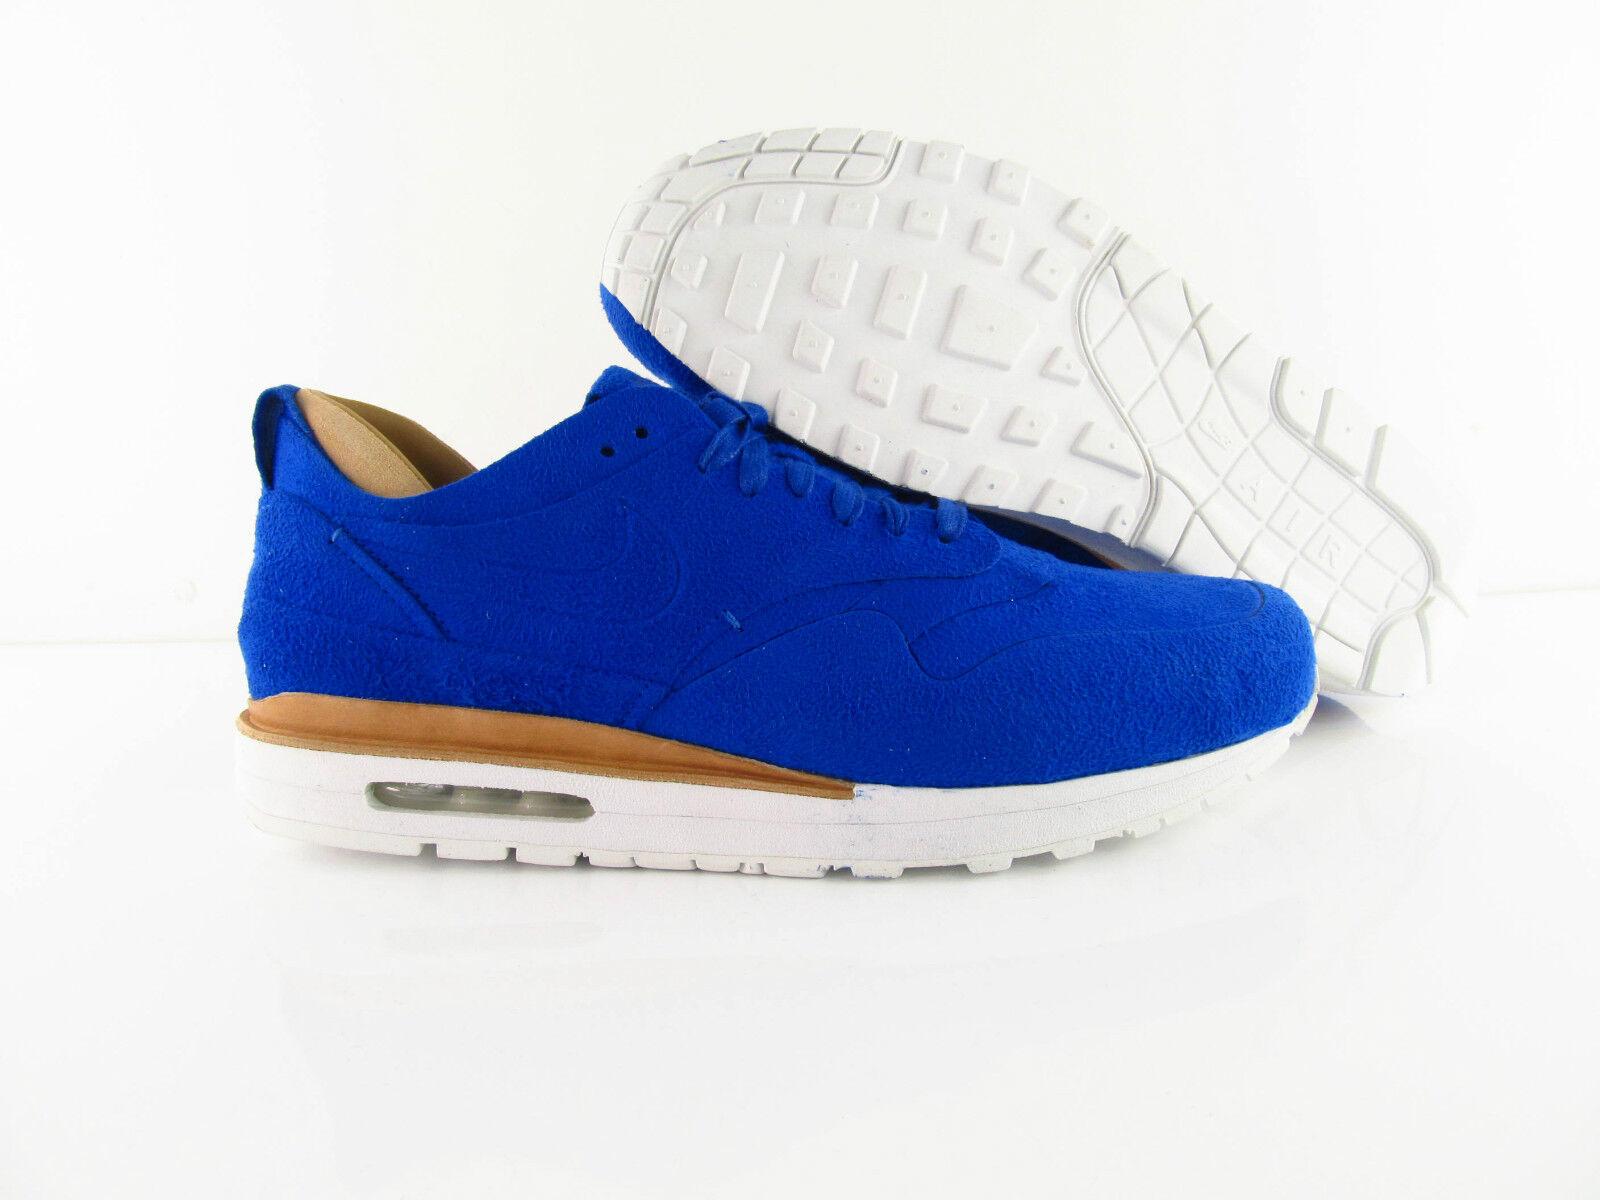 Nike Nike Nike Wmns Air Max 1 Royal Game Blau 90 Nikelab UK_4.5 US_7.5 Eur 38.5  e87c16